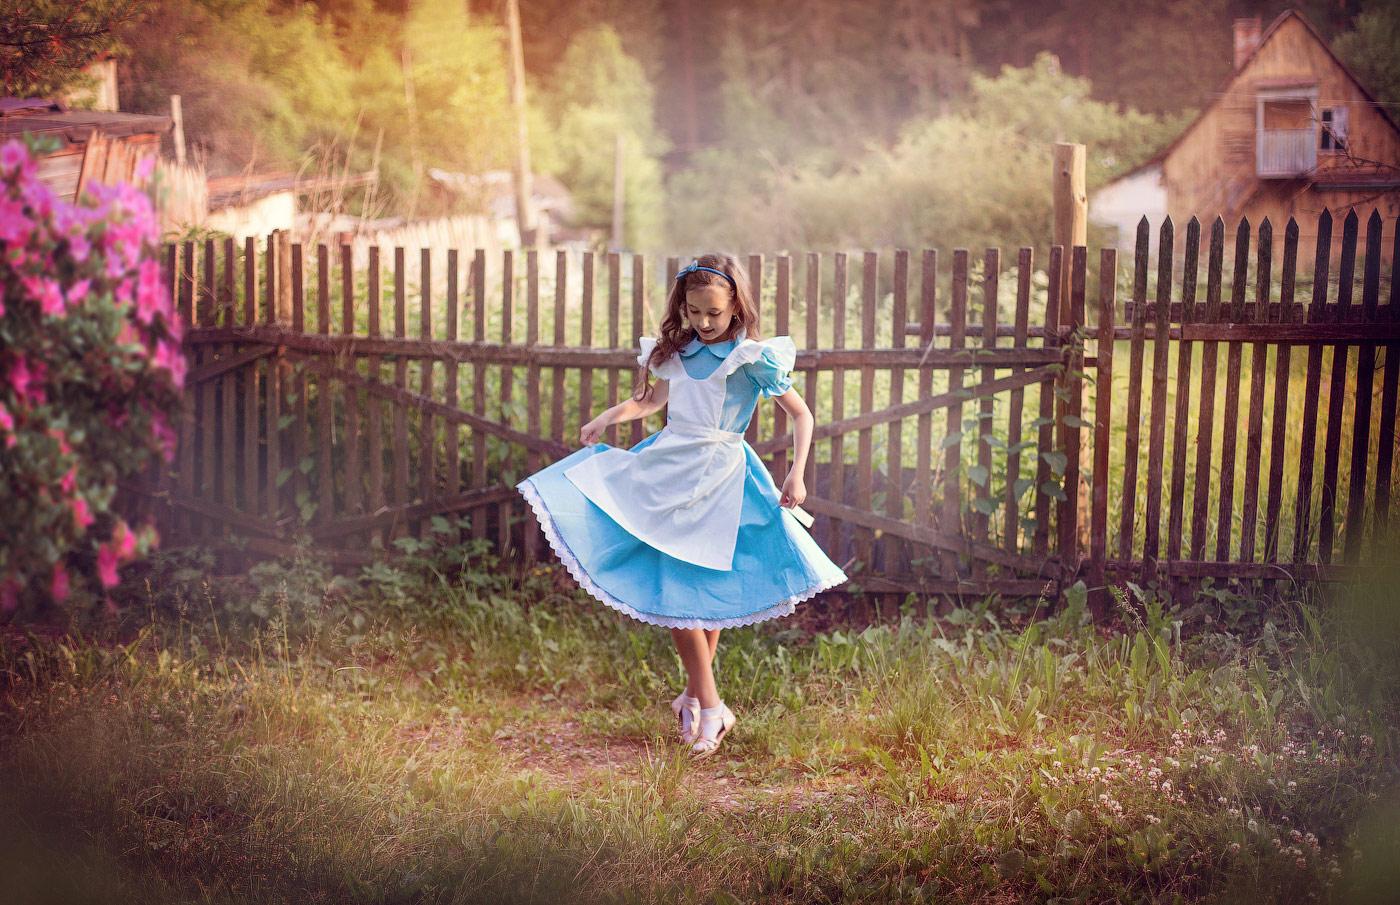 Wonderfull mood, © Оксана Ривер , Фотоконкурс Family Russian Photo Award журнала «Российское фото»